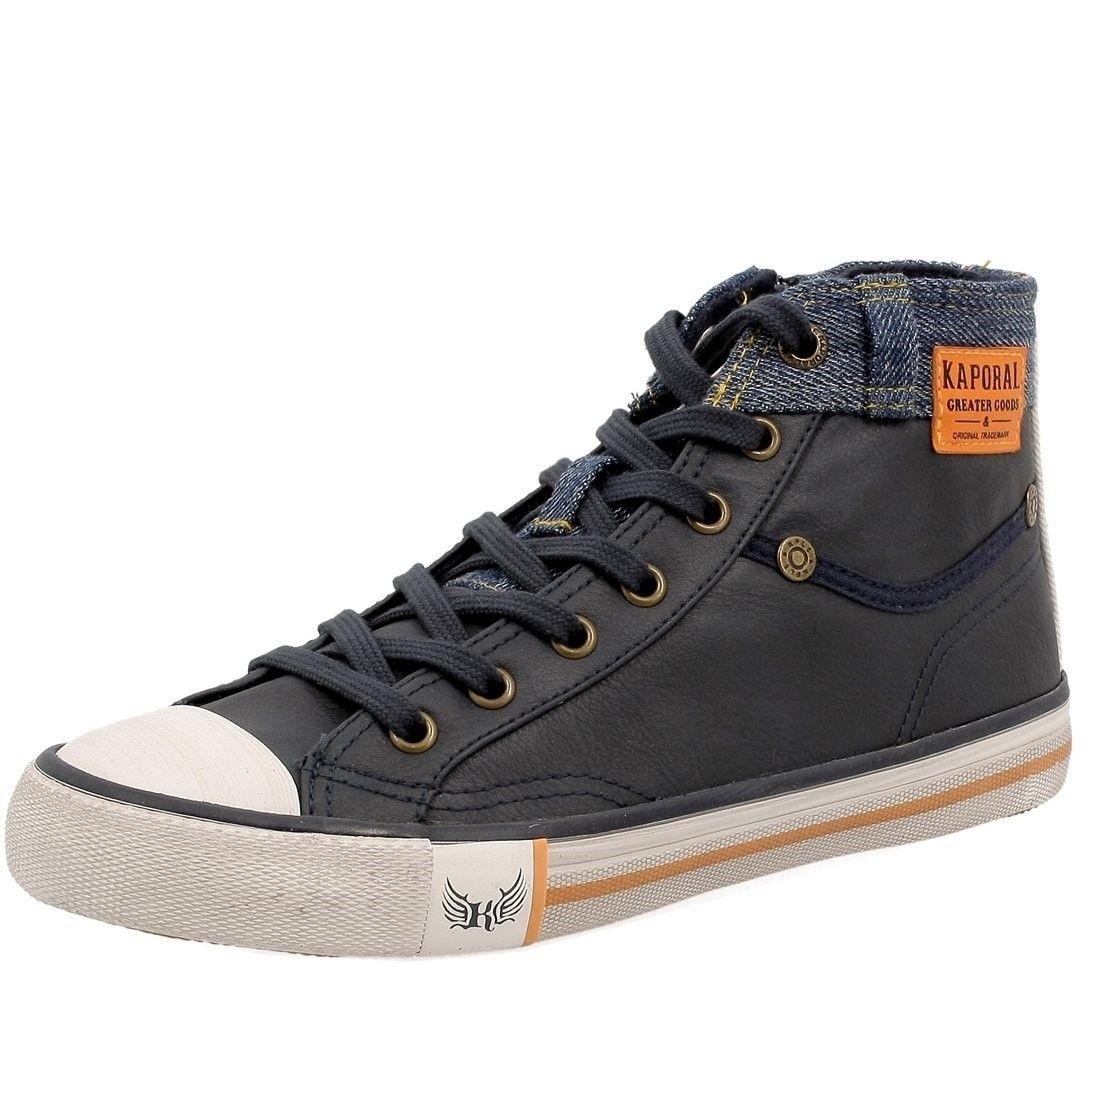 Garçon Kaporal Enfant Icarnito Chaussures 515500 v4dnwqH